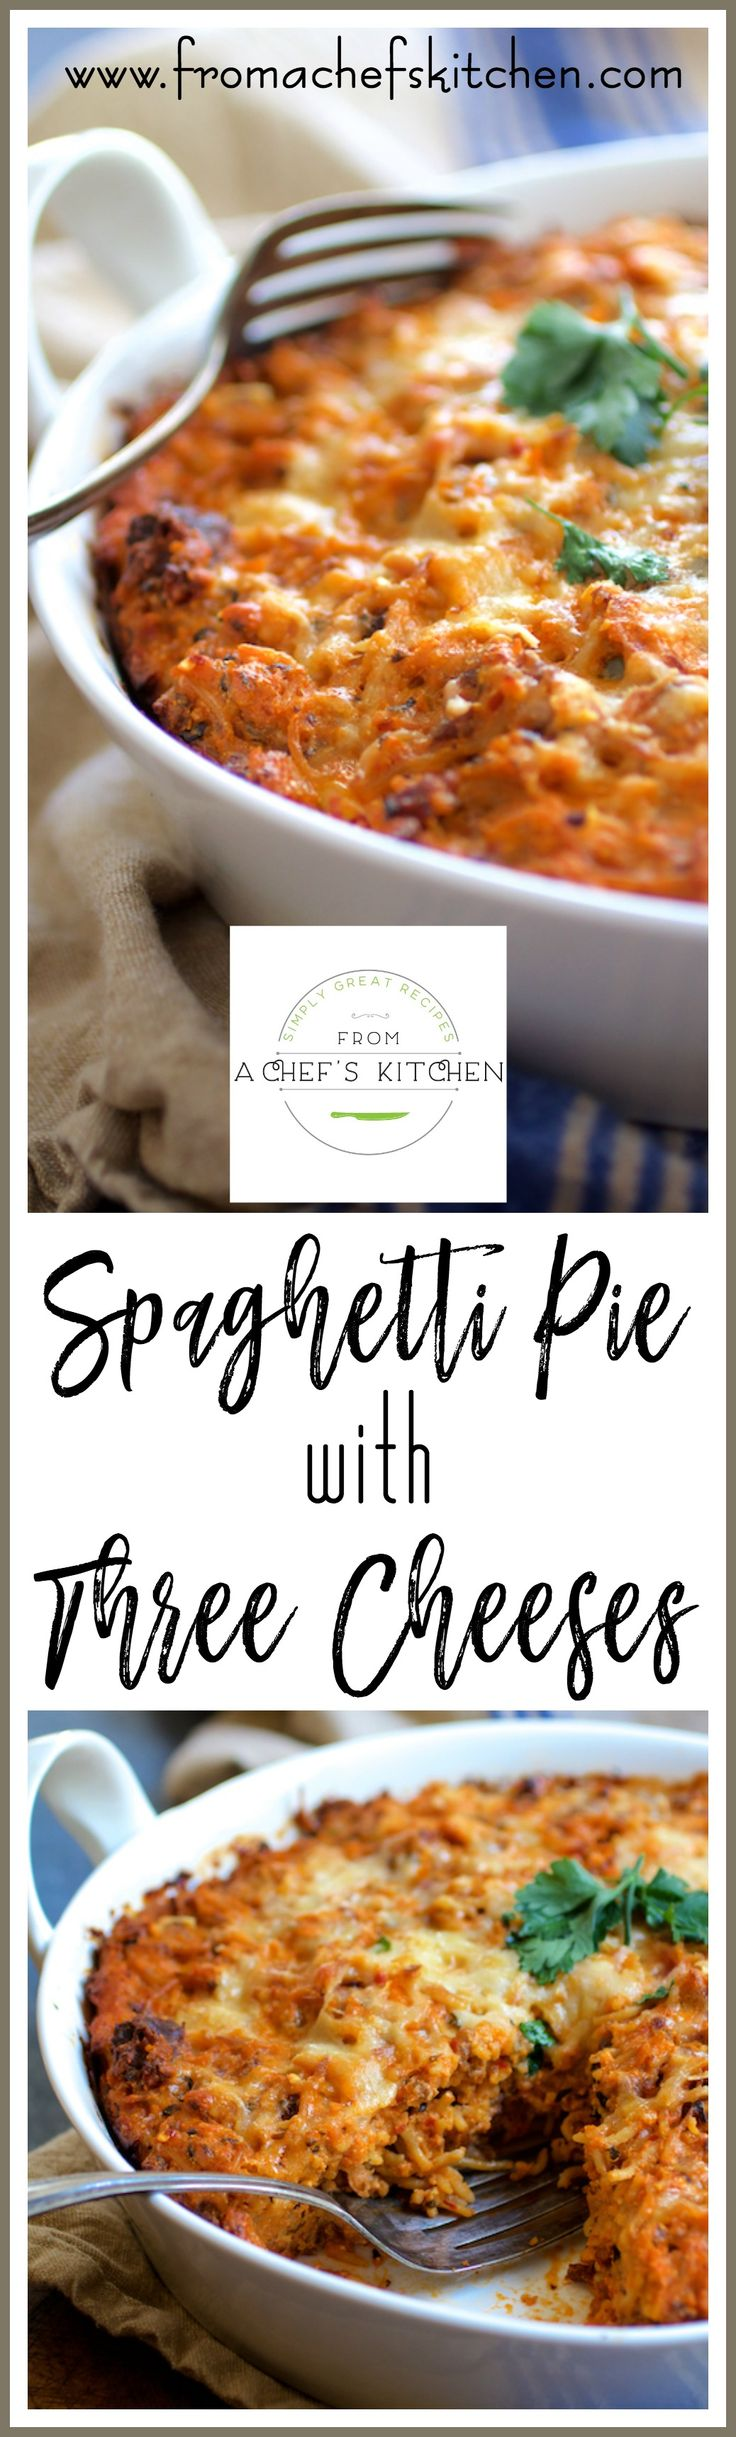 Spaghetti Pie with Three Cheeses--smoked mozzarella, ricotta and Parmesan--is how to turn leftover spaghetti into something amazing! via @chefcarolb